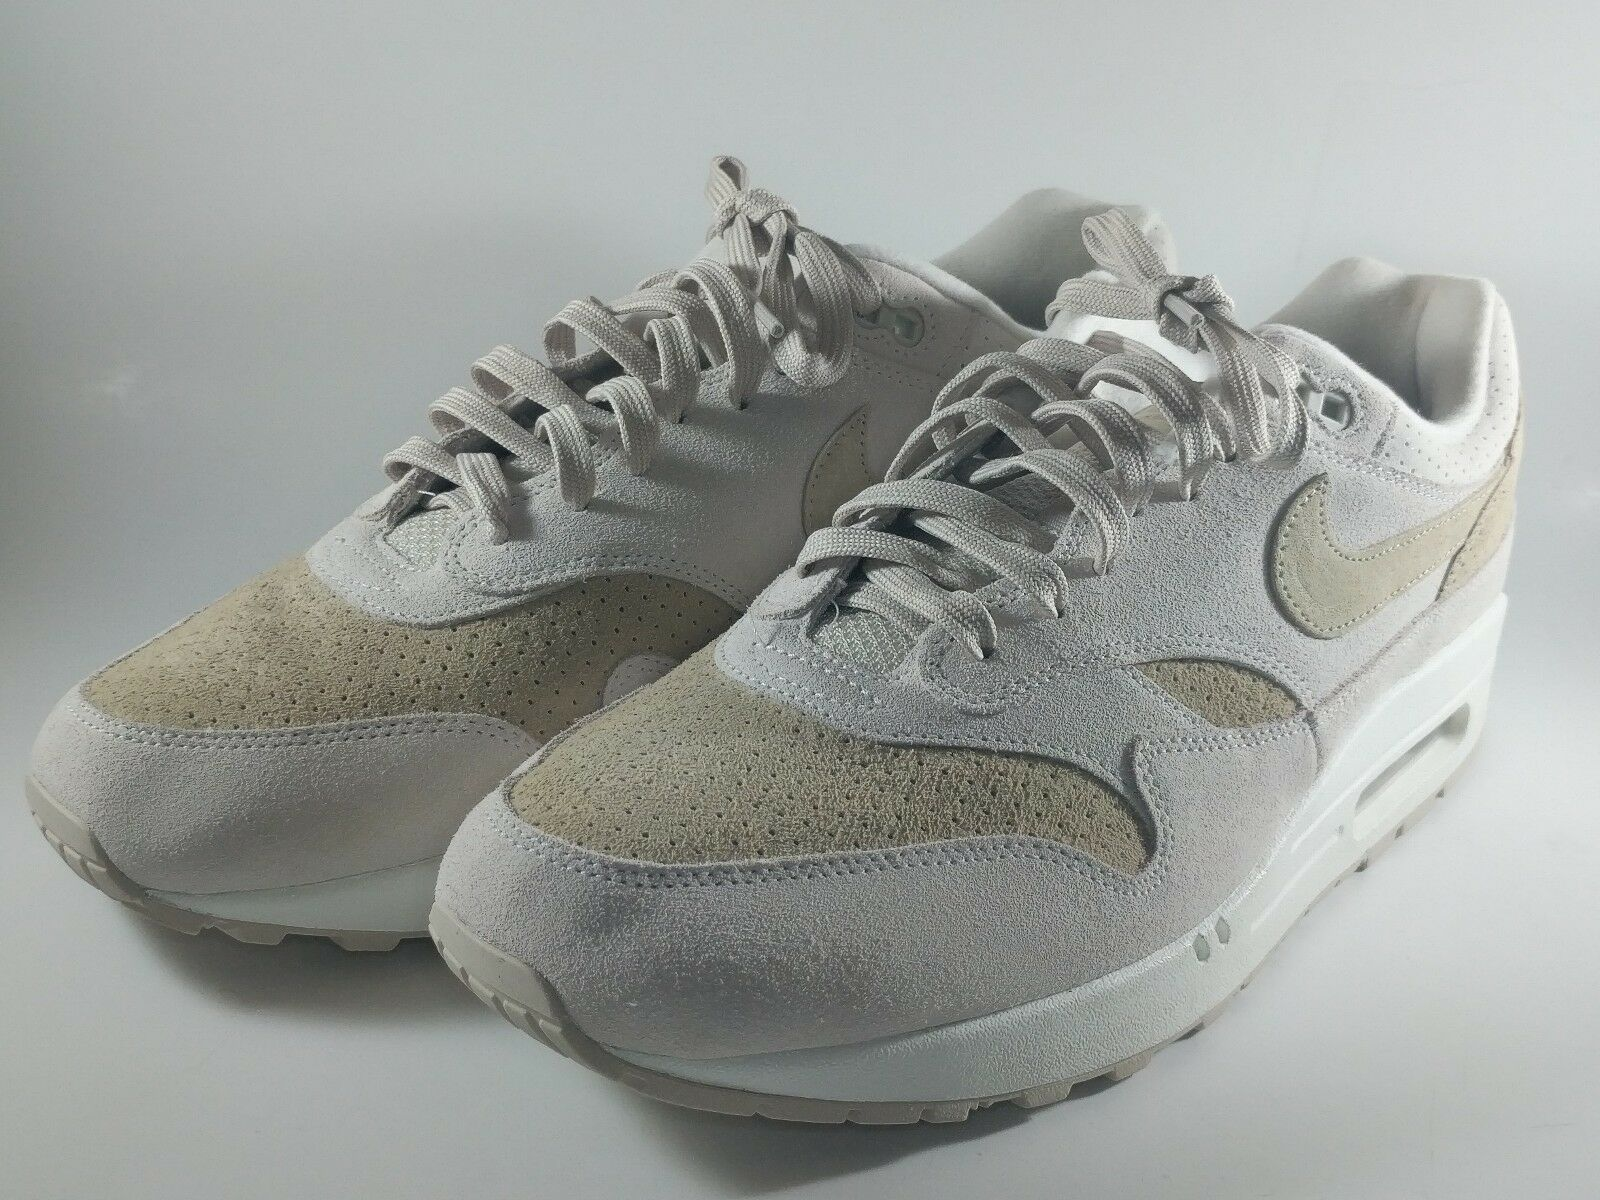 Nike Air Max 1 PRM Desert Sand Tan Suede White Beige 875844-004 sz 13 Running